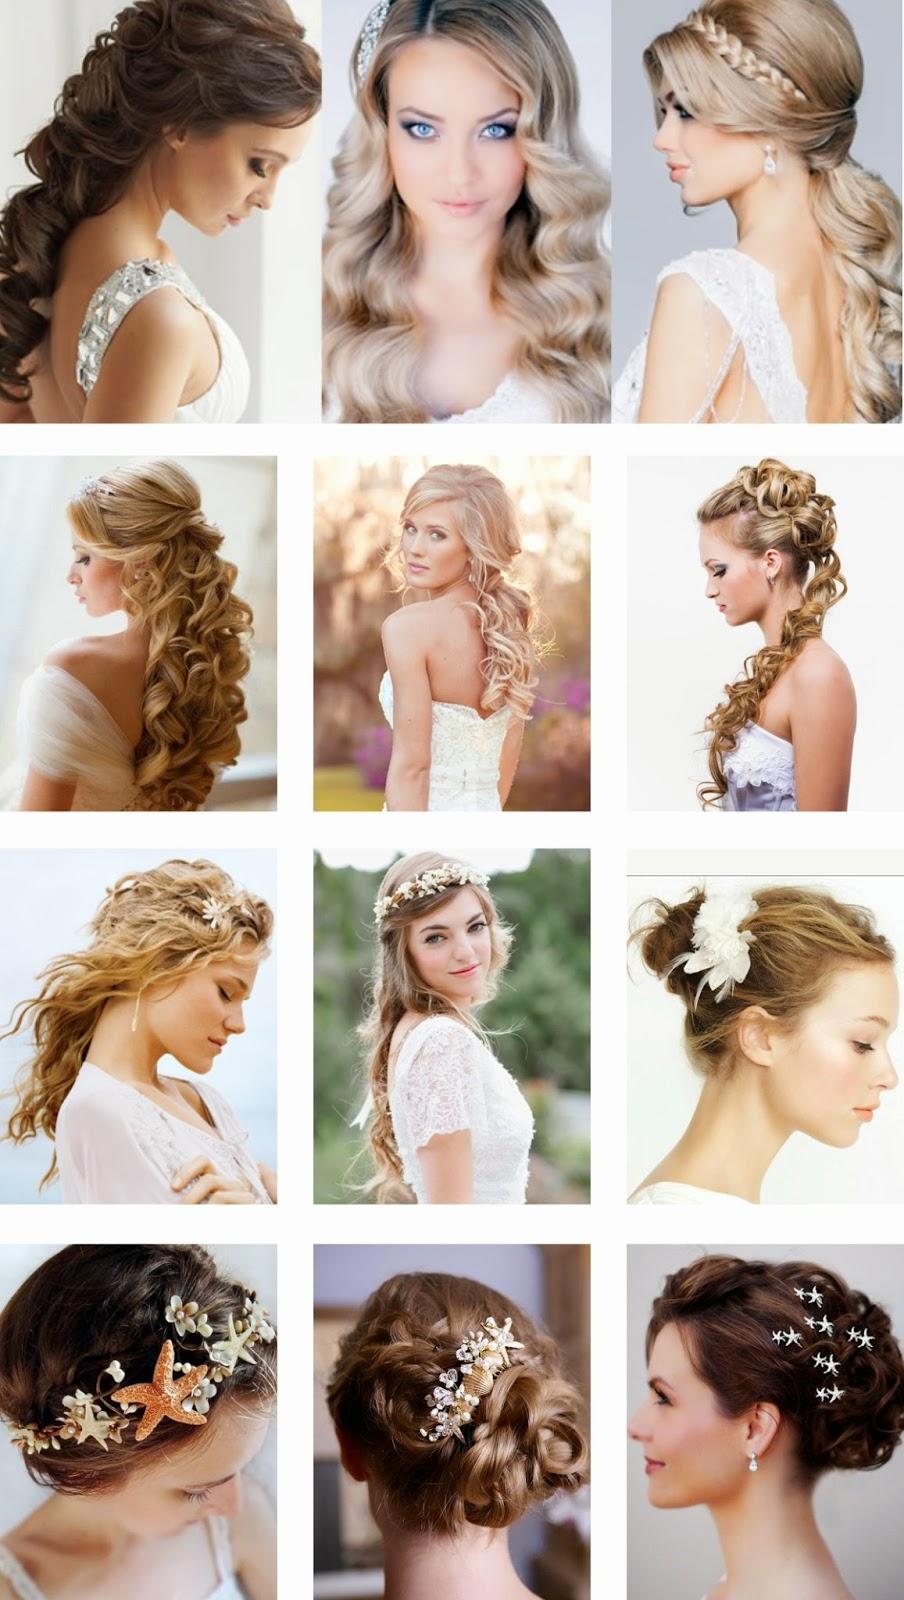 Peinado novia boda playa